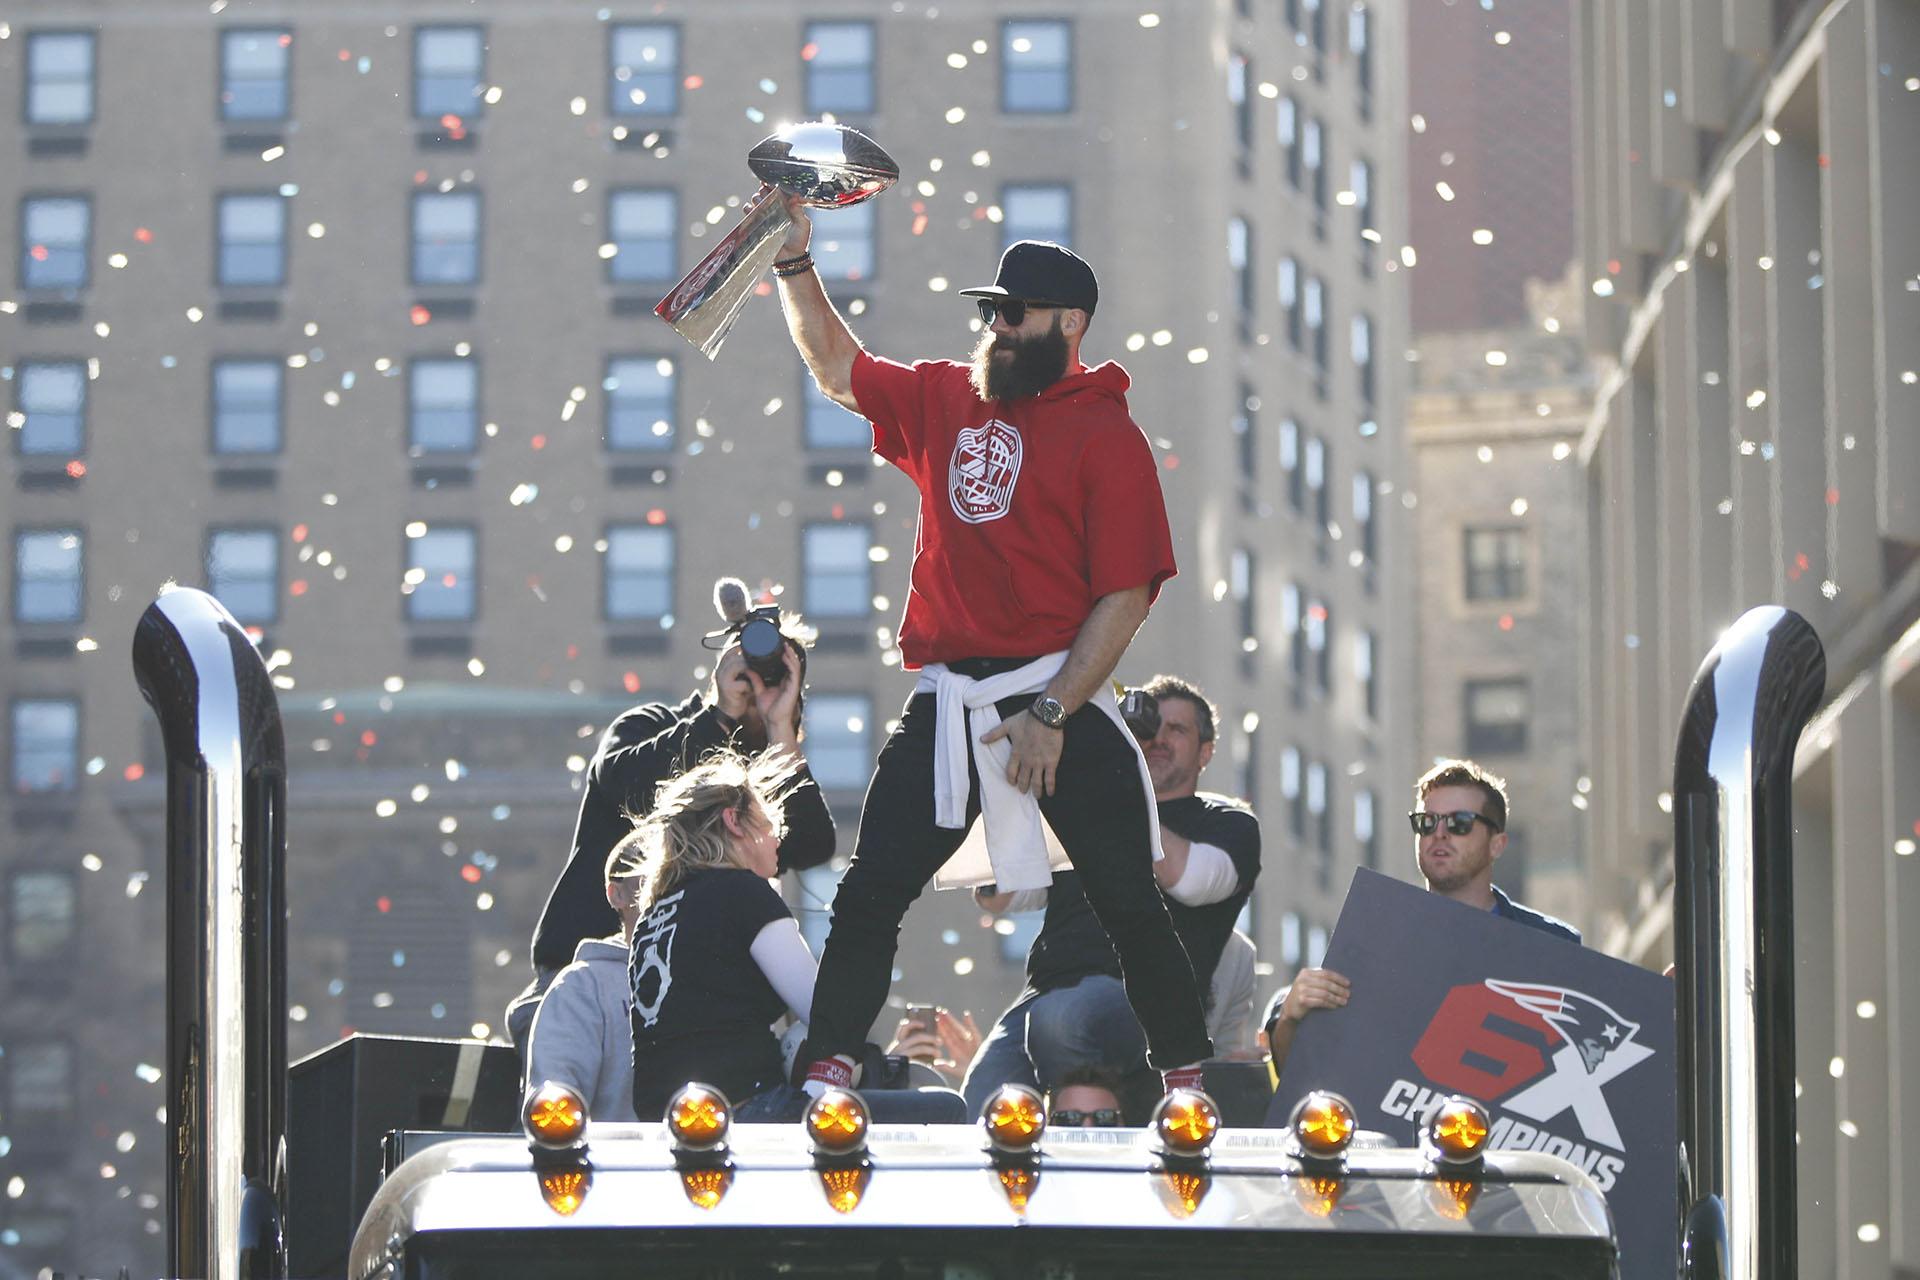 Julian Edelman sostiene el trofeo Vince Lombardi